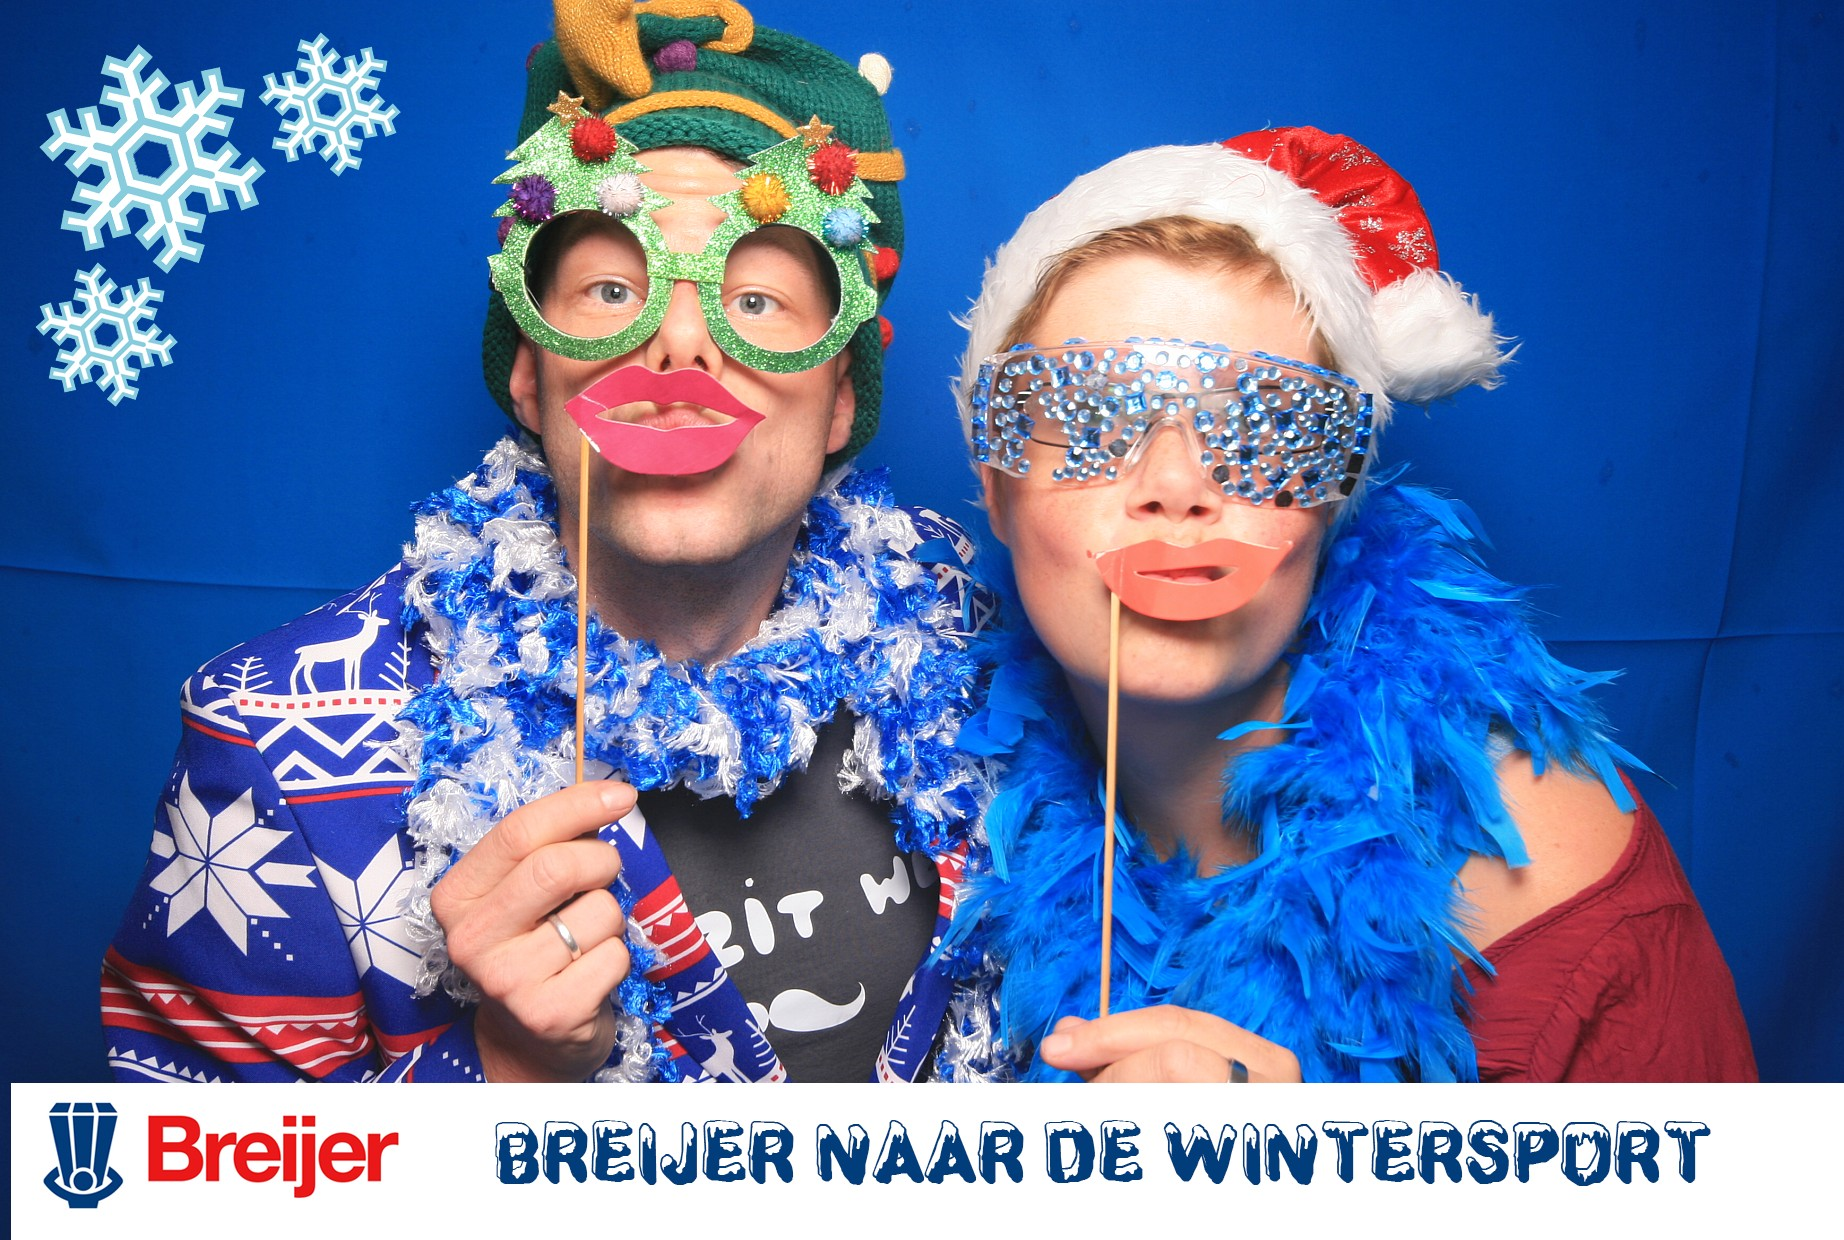 Wintersport photobooth